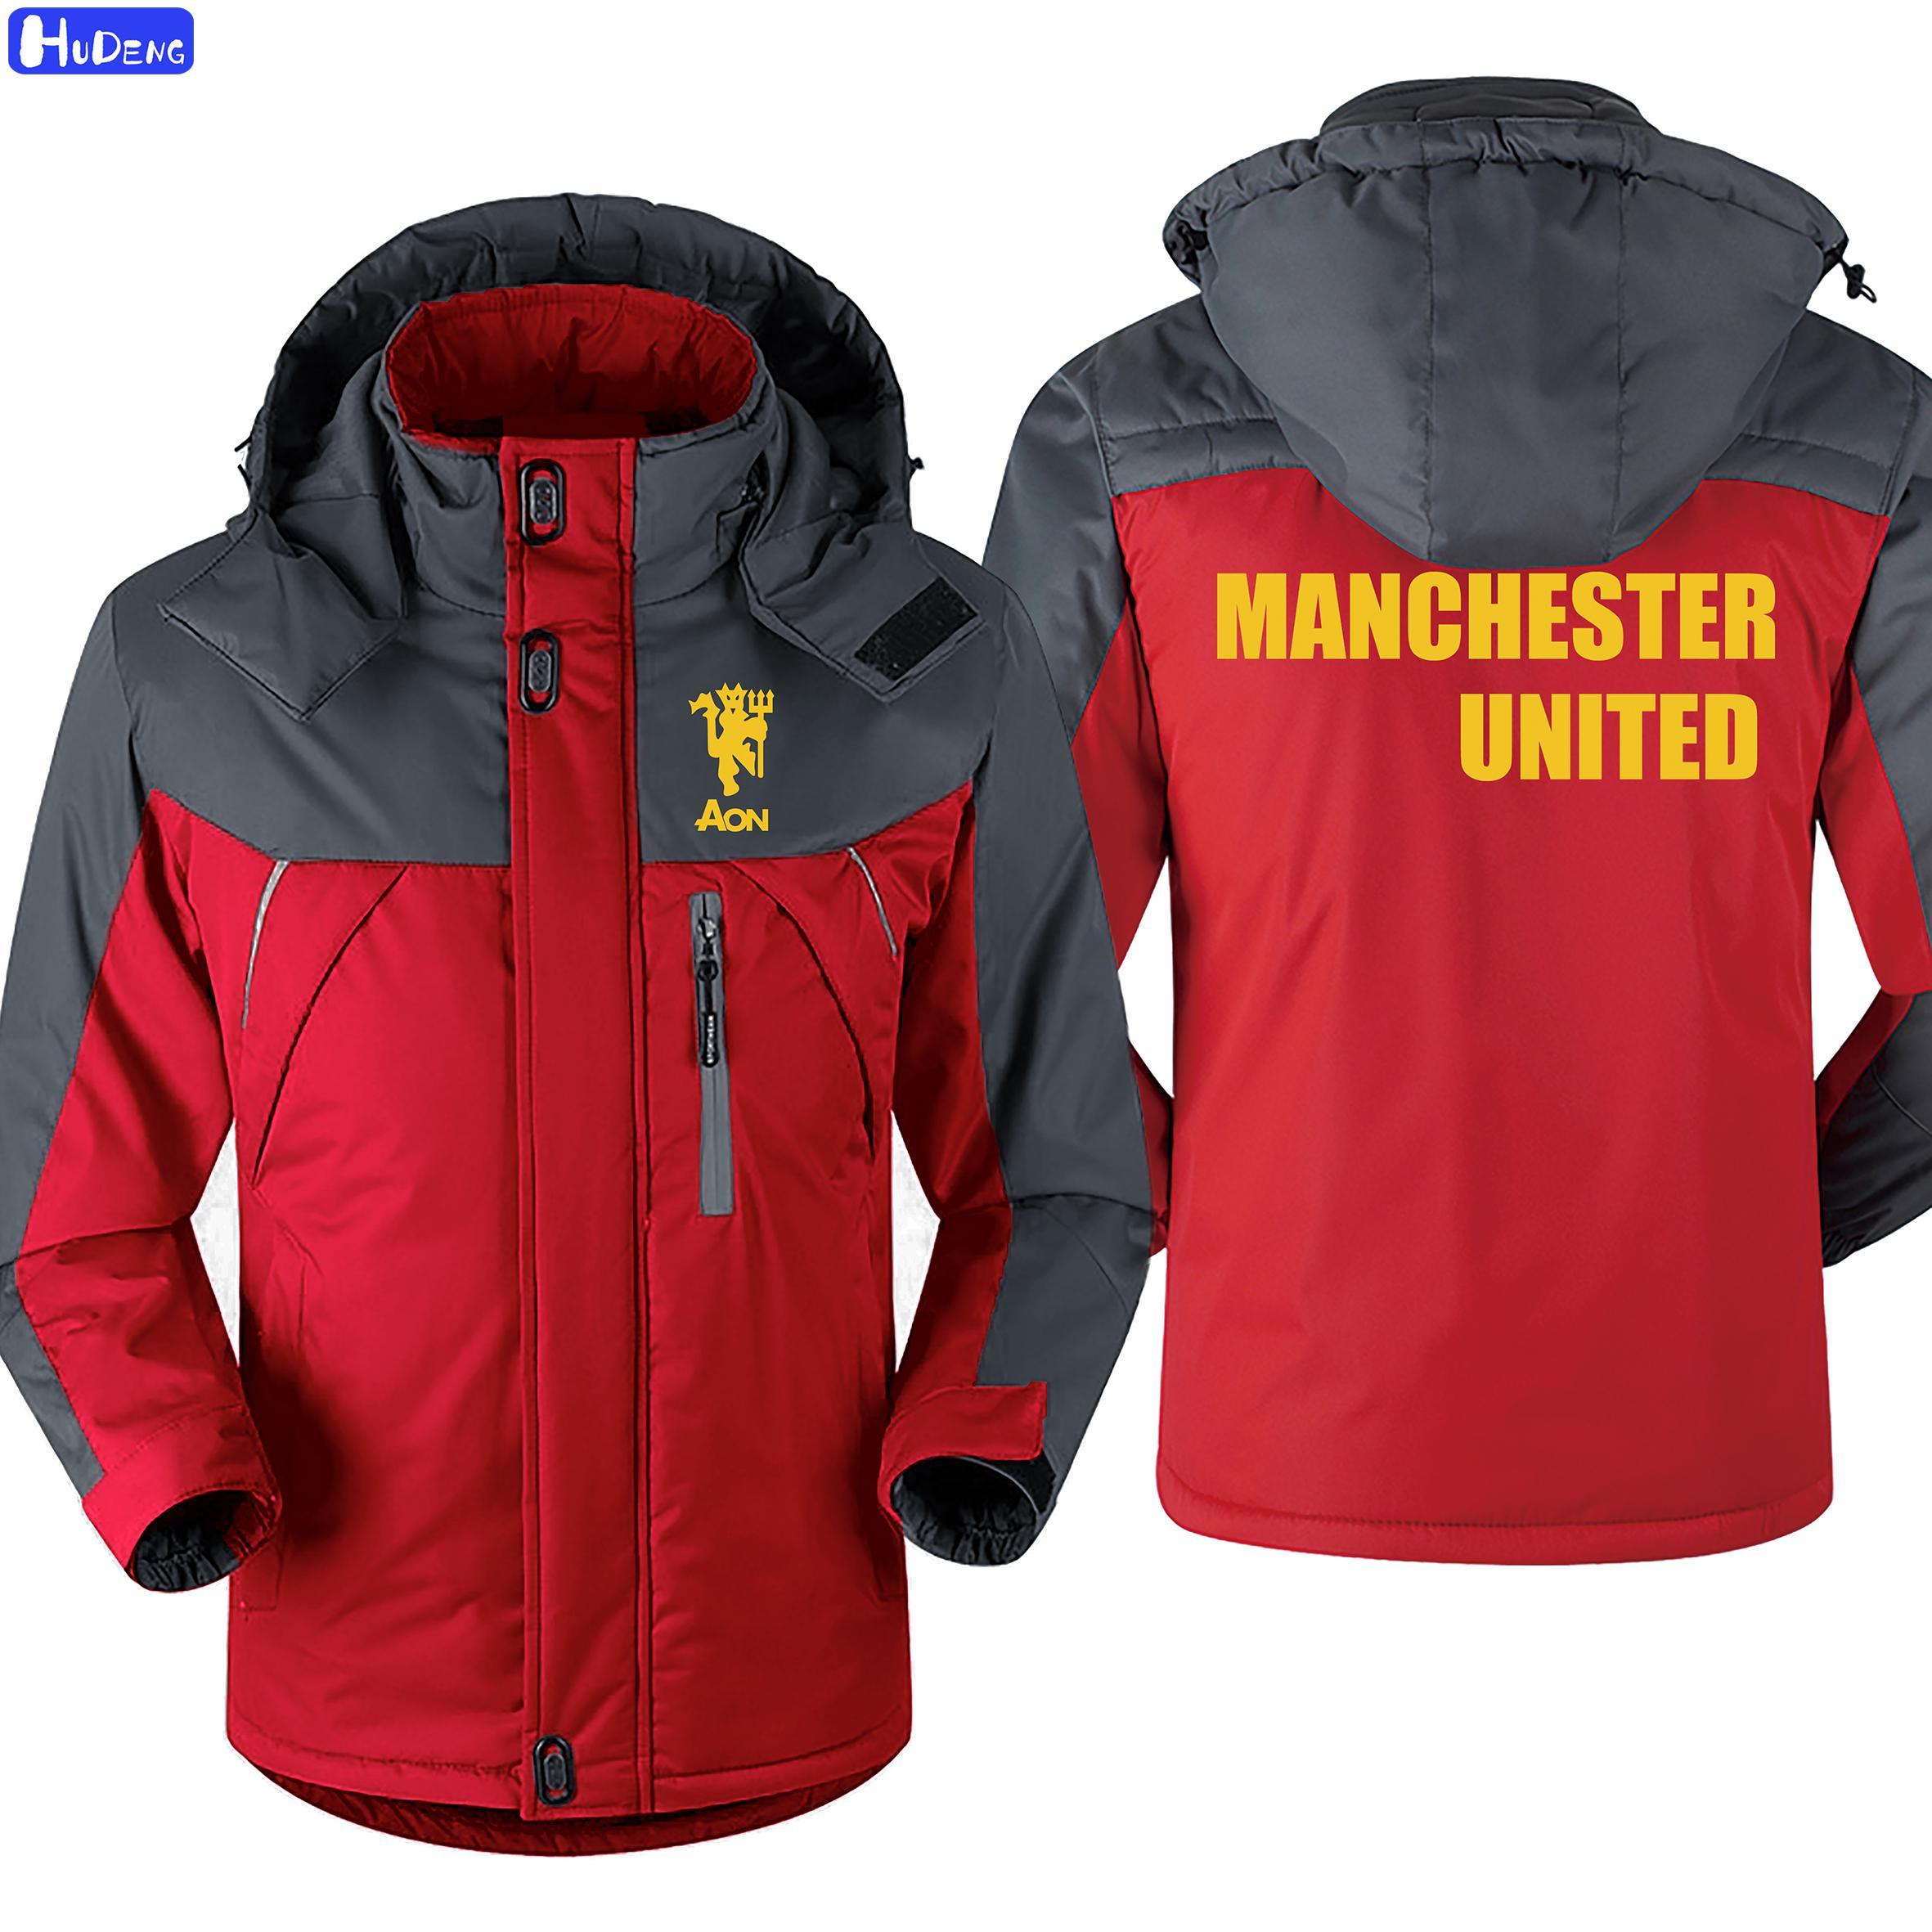 HD New Men's Coat Manchester United Football Sports Uniform MEN Sports Jacket Men Winter Man Windproof M8 Casual Cotton5-6-7XL